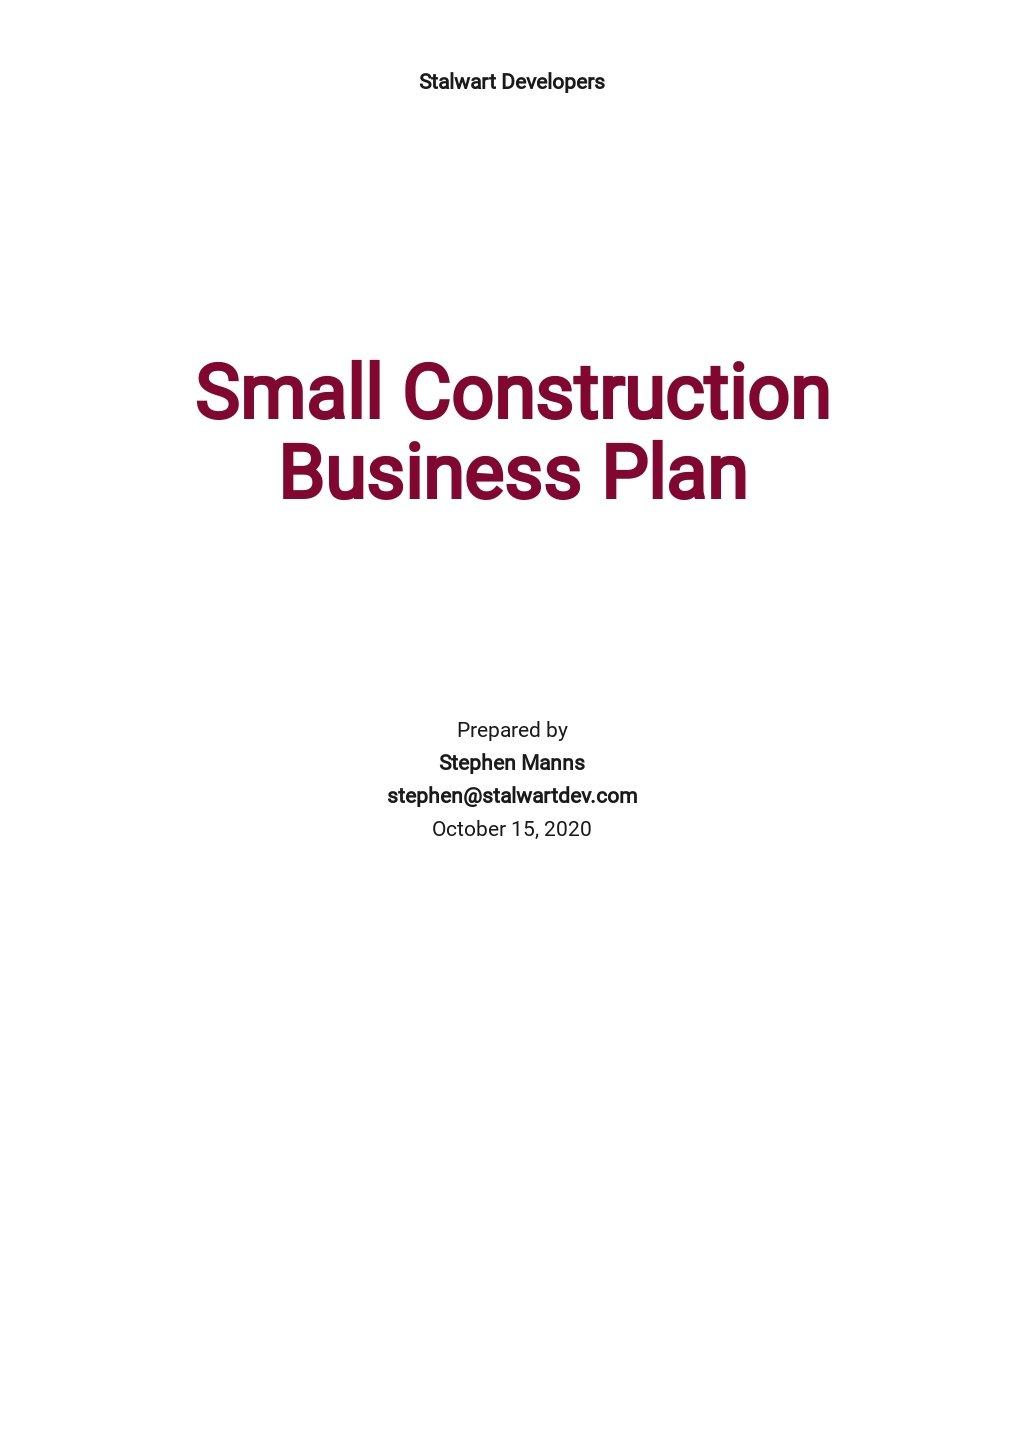 Small Construction Business Plan Template.jpe